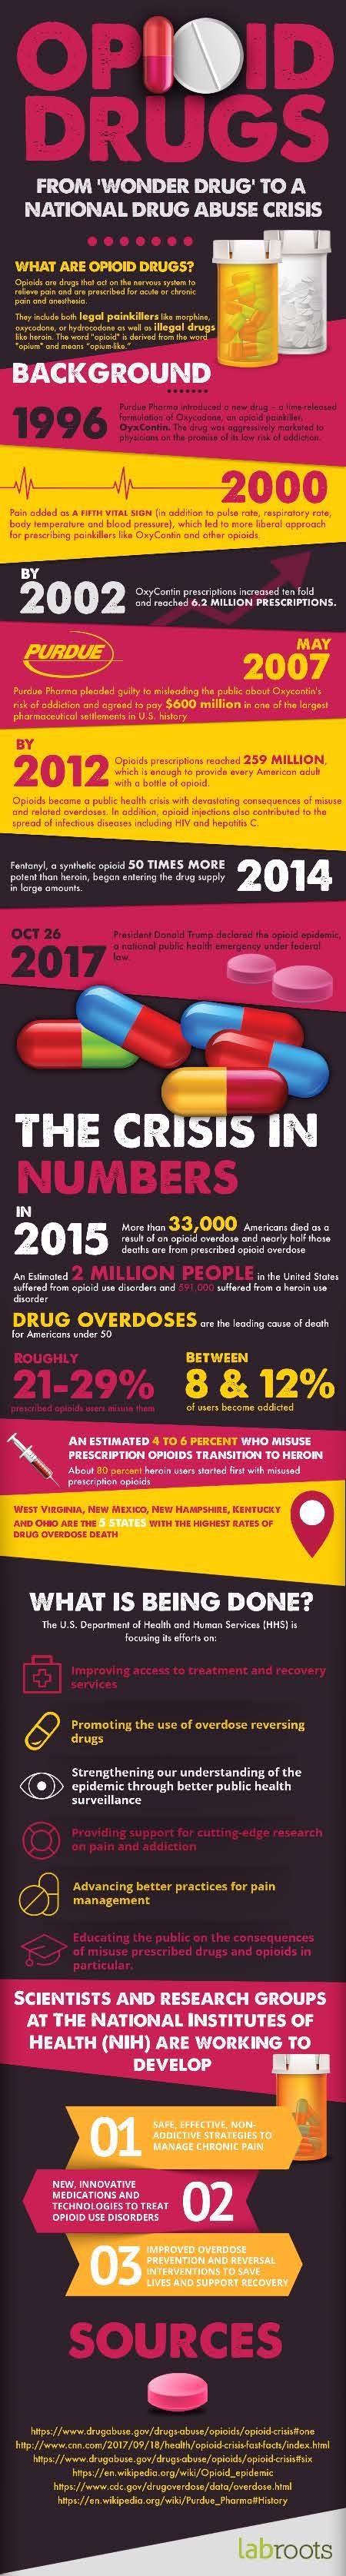 How a 'Wonder Drug' Led to a National Drug Abuse Crisis - Infographic